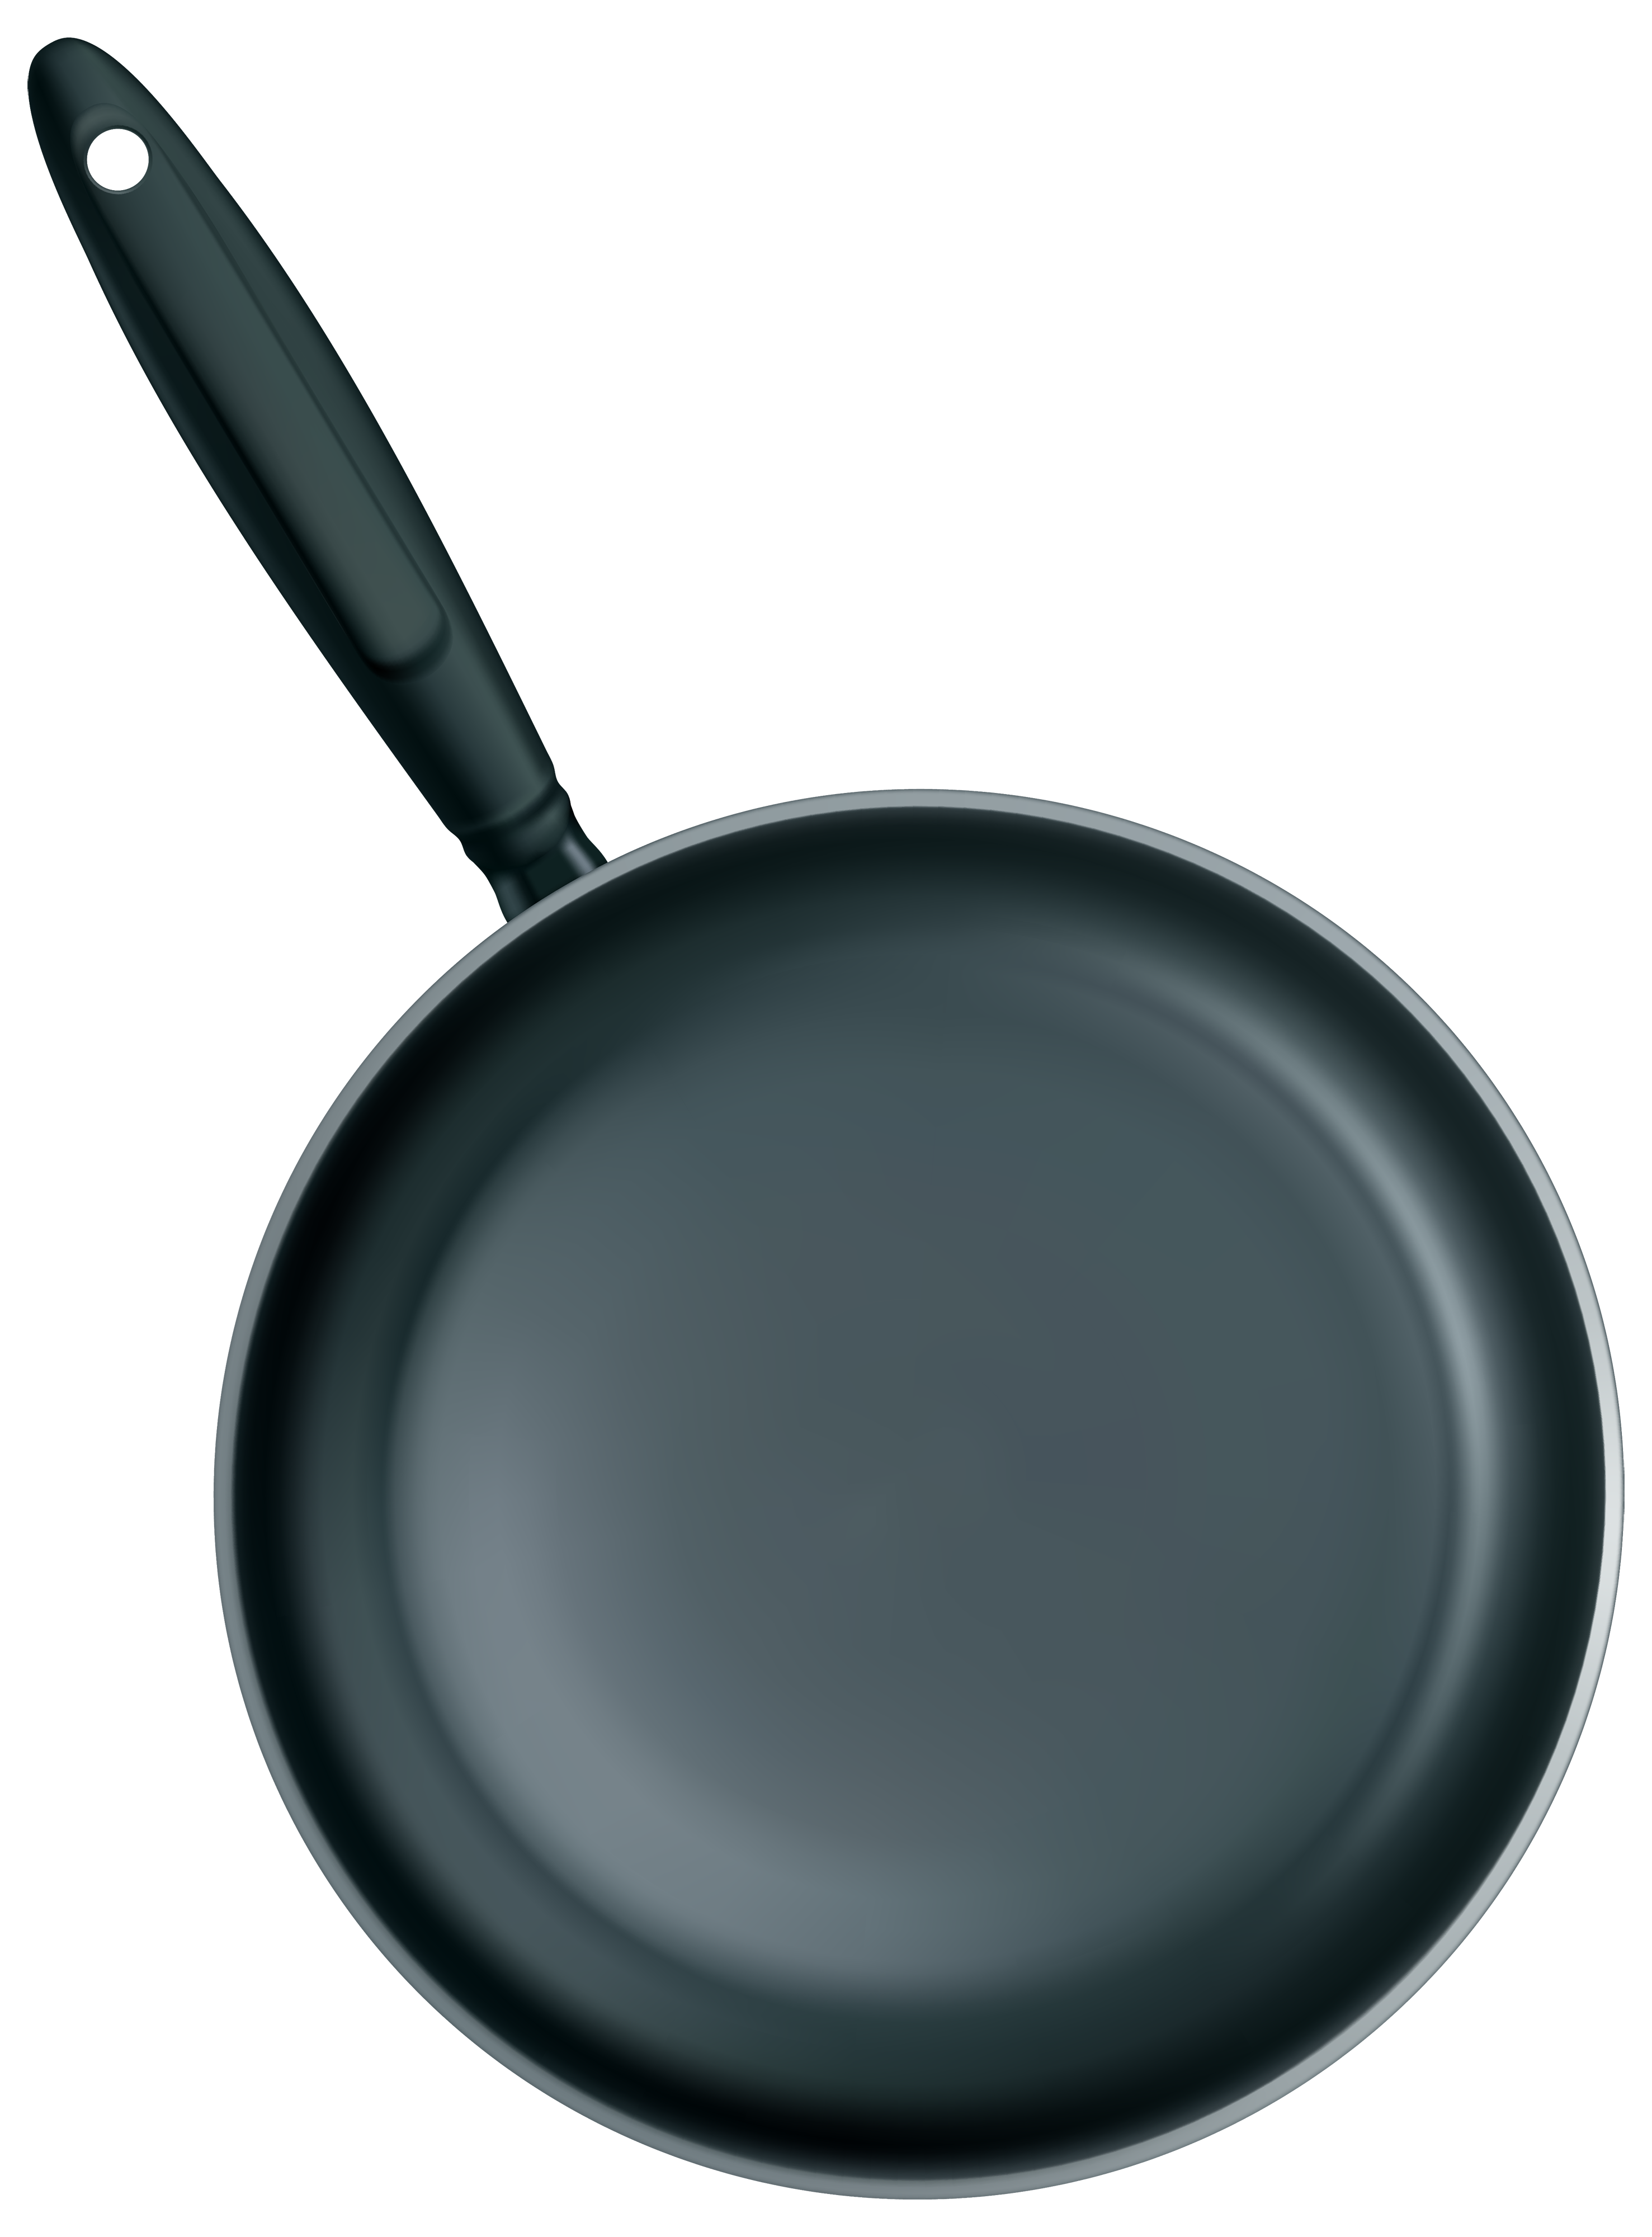 Free Pan Clipart Best Tool Clip Art ⋆ ClipartView.com.